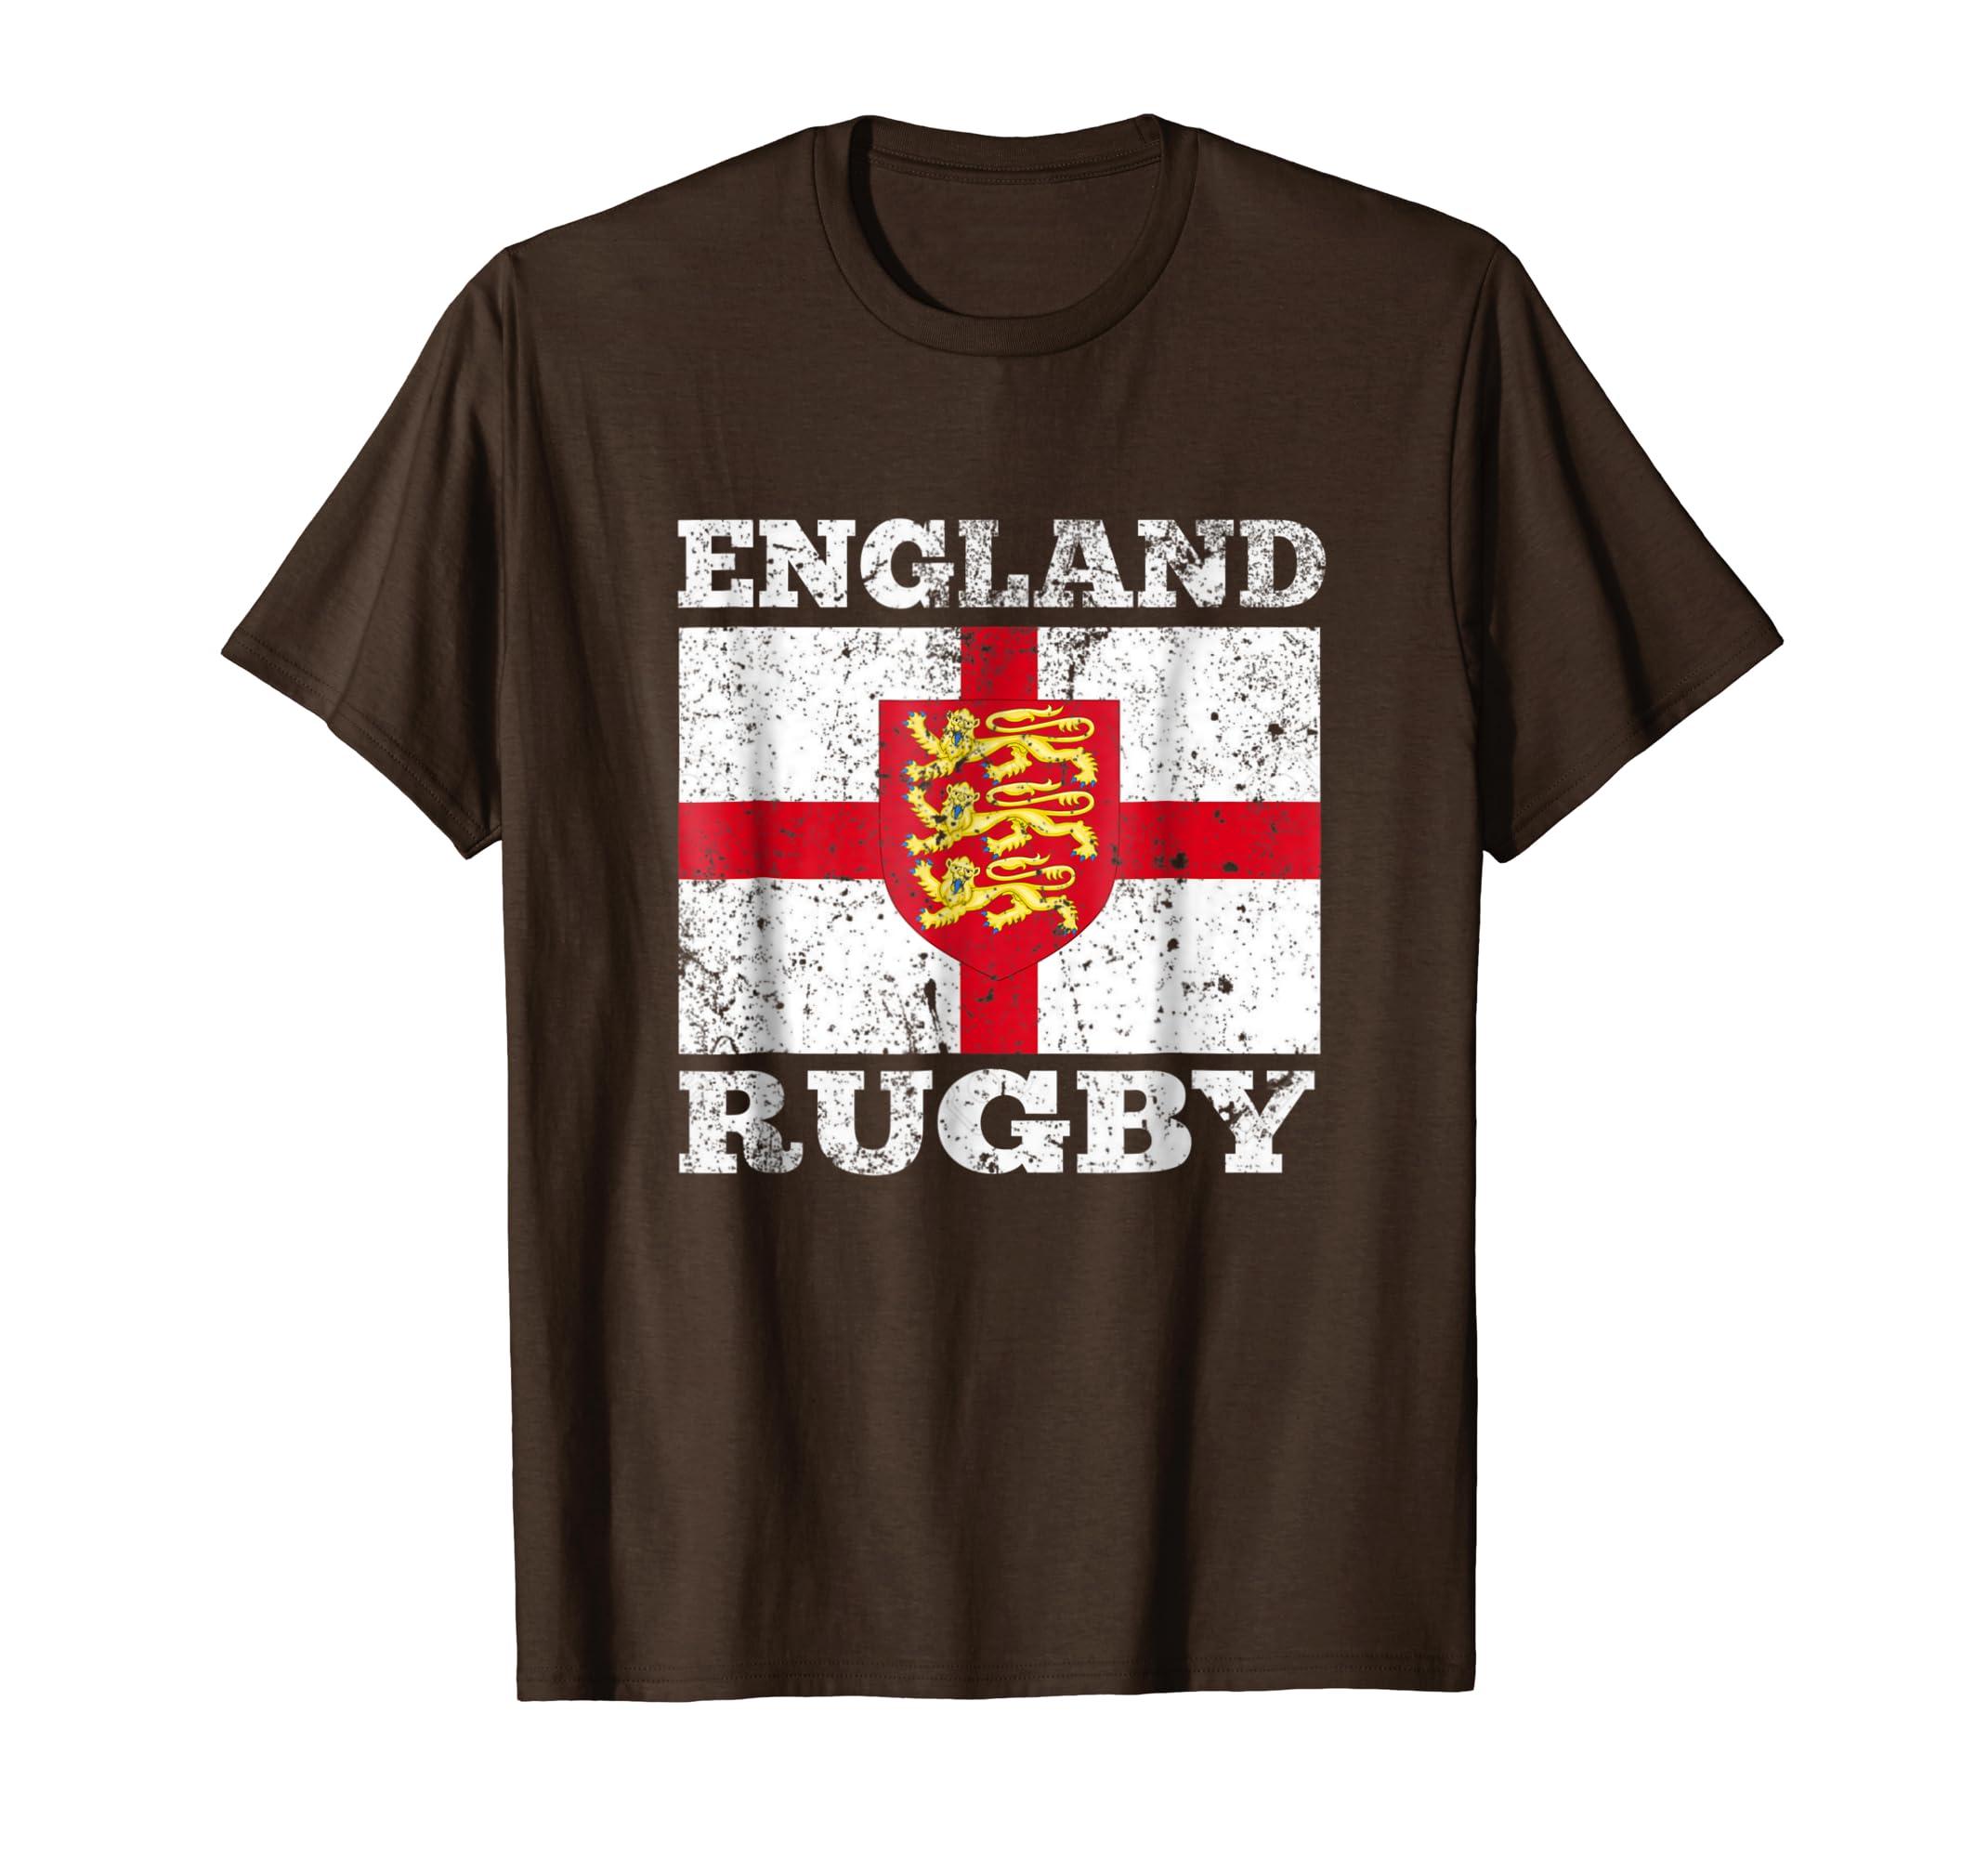 3889b3f6437 England Vintage Rugby Shirt - DREAMWORKS